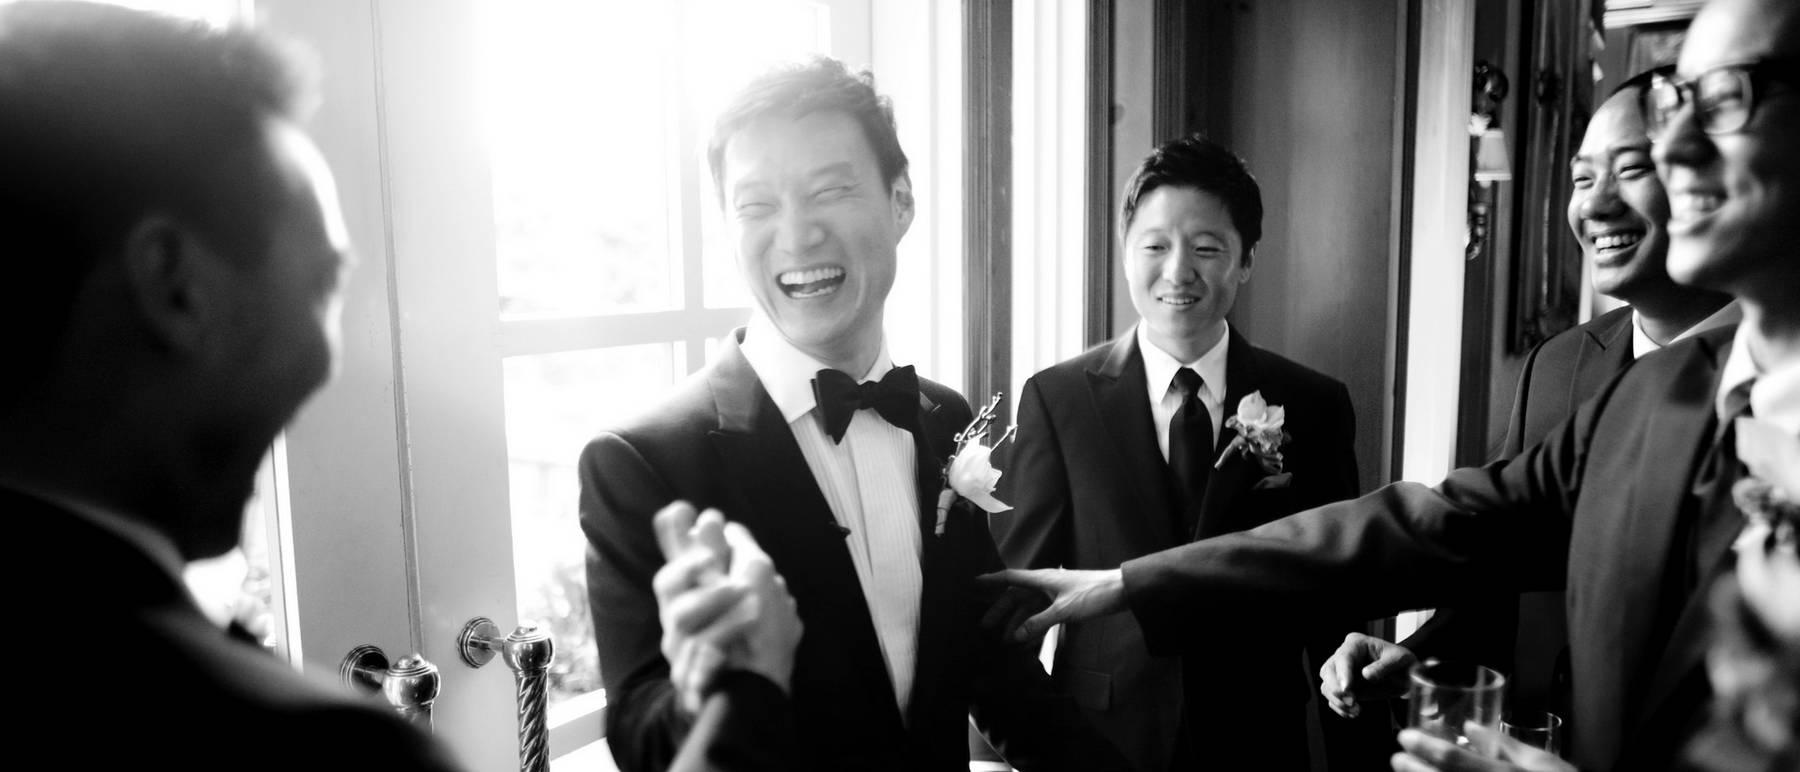 johnandjoseph-wedding-photographer-hz-slider-281